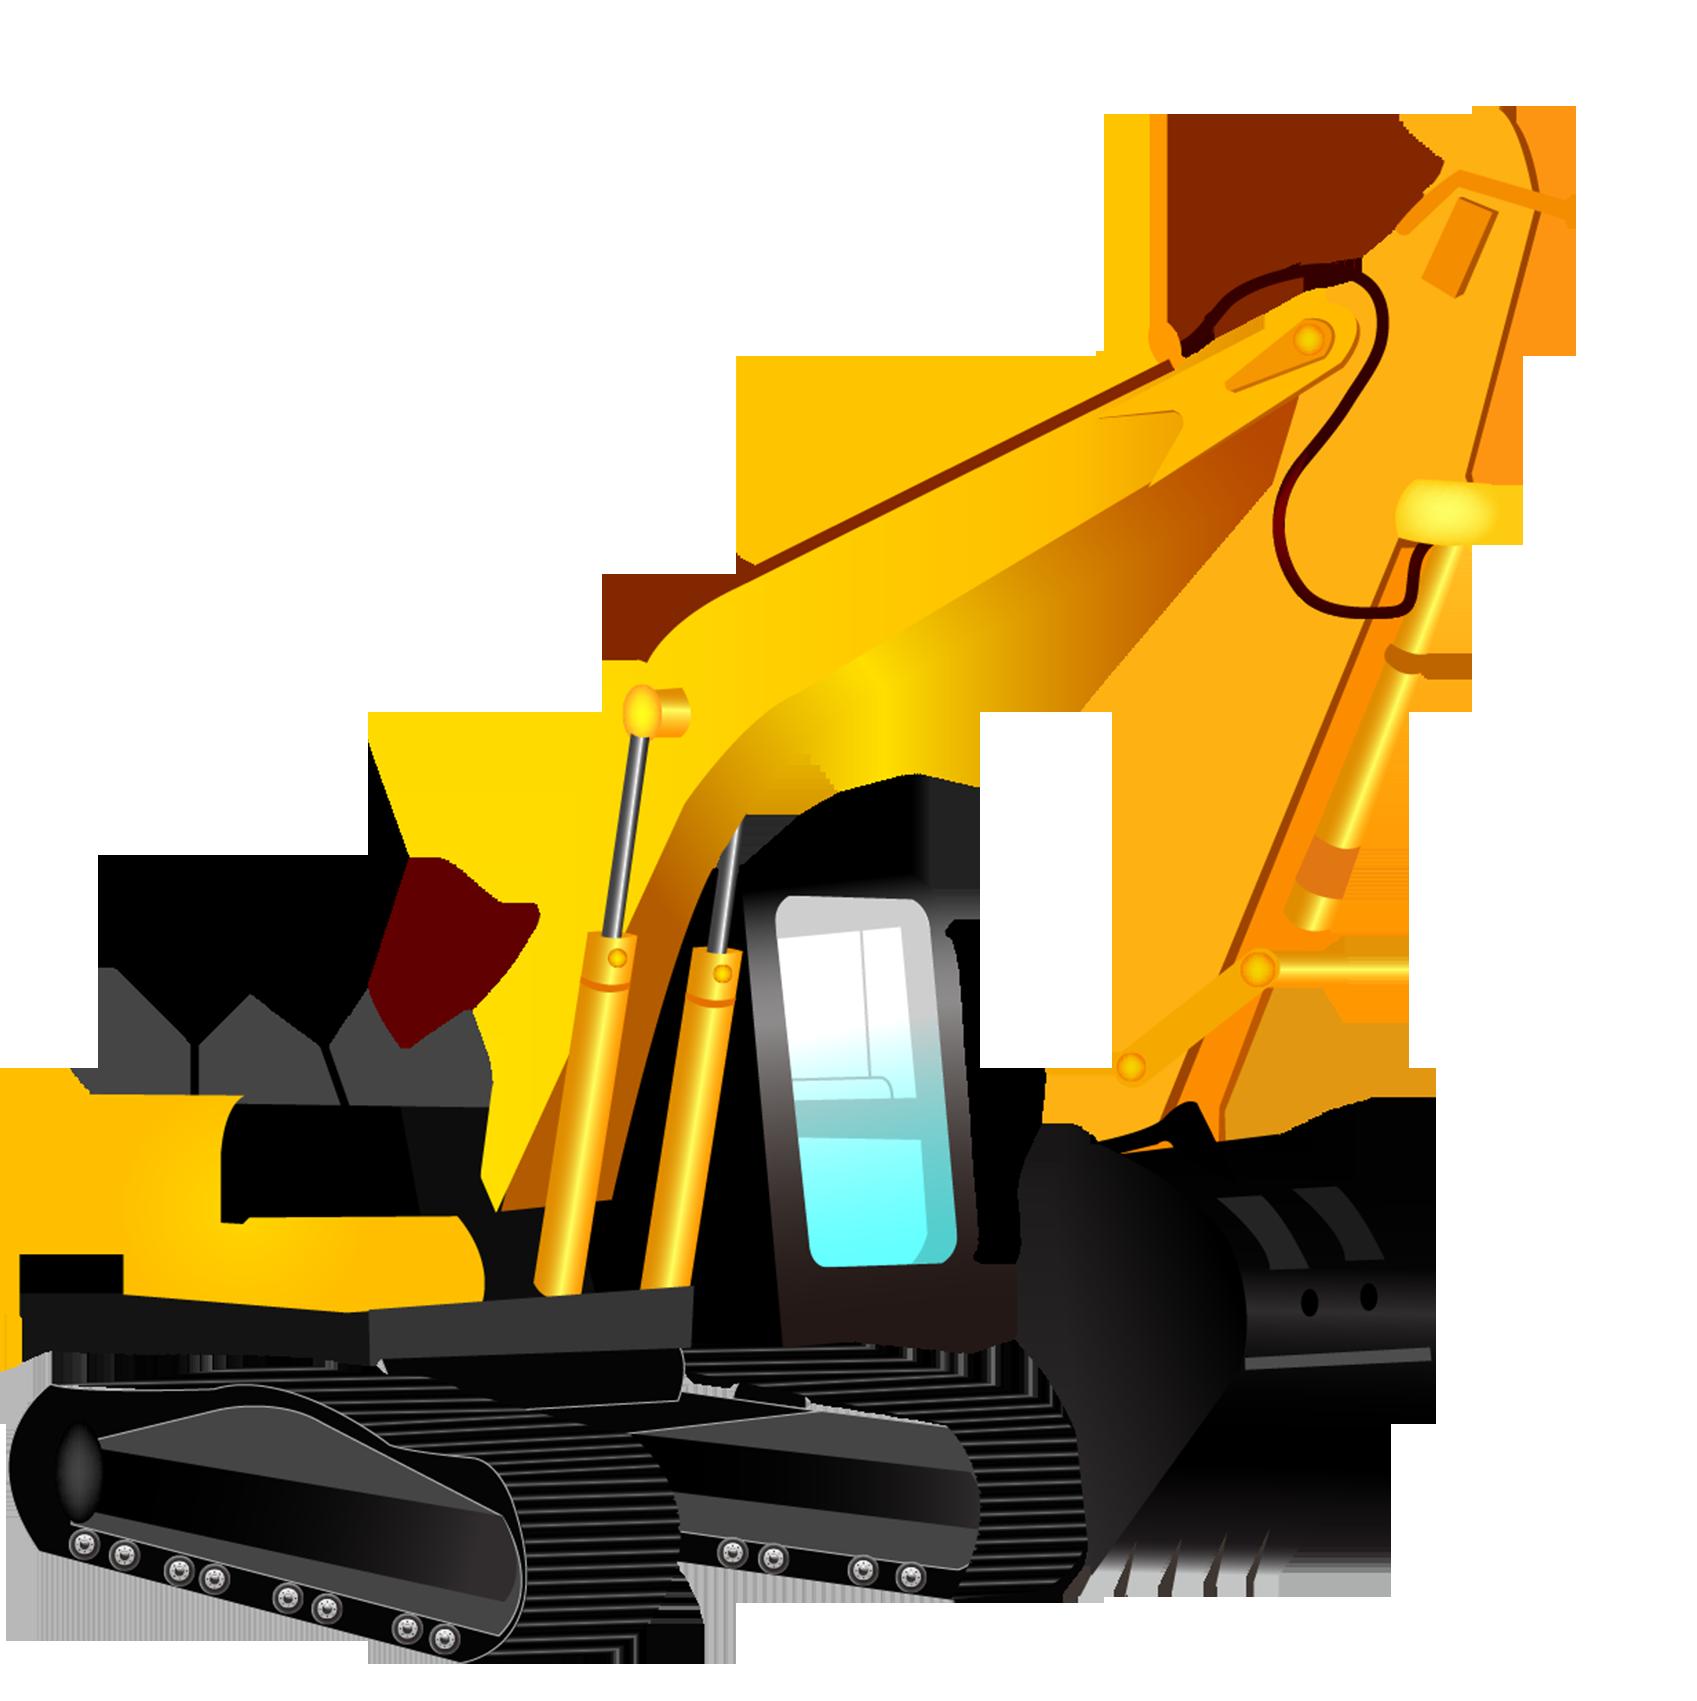 Inc backhoe bulldozer cartoon. Excavator clipart excavator caterpillar